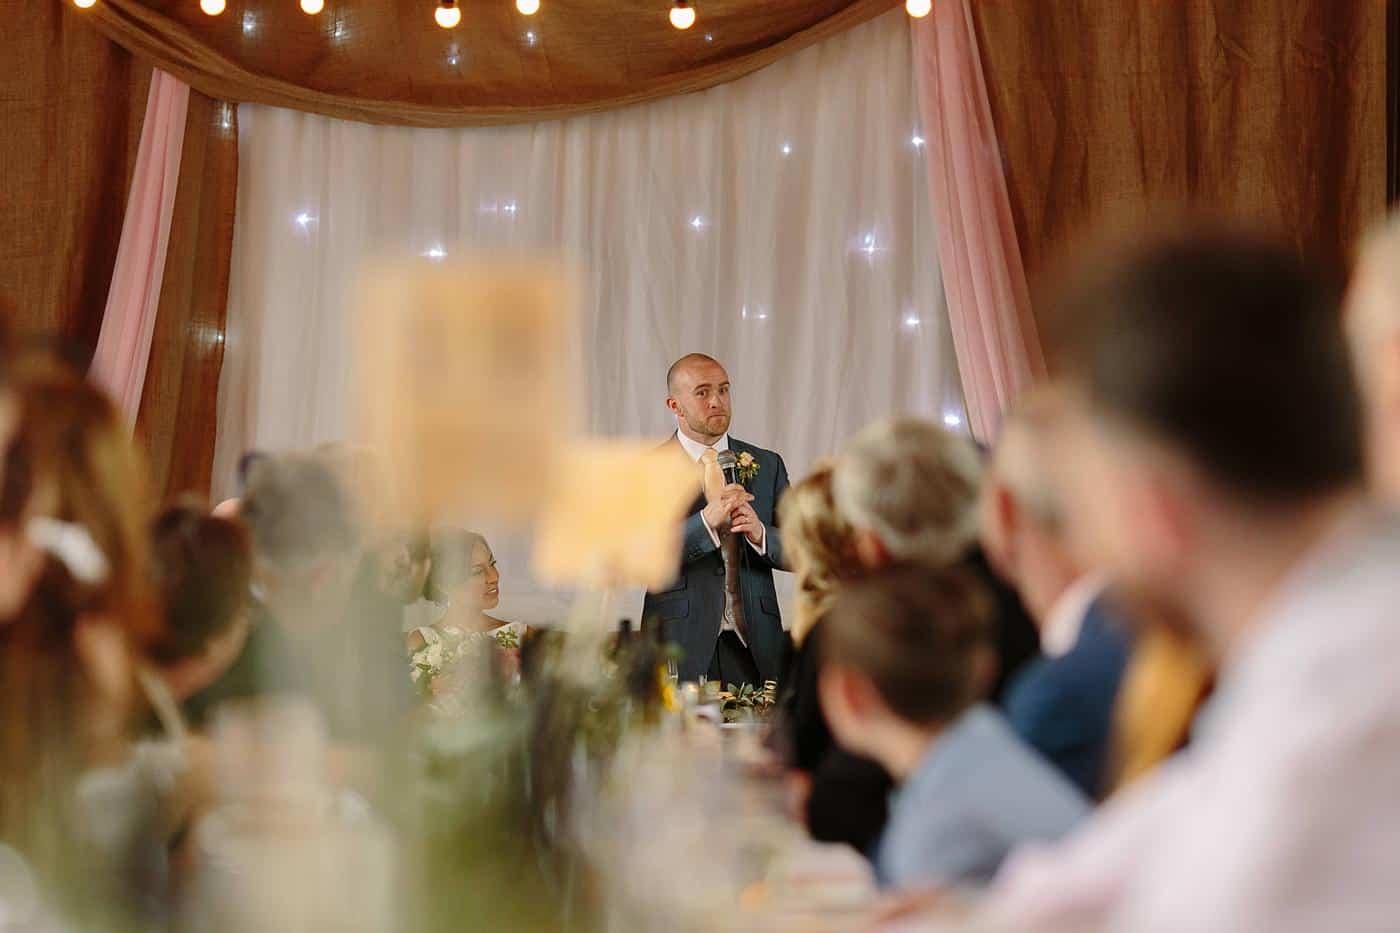 Winstanstow wedding photography 0855